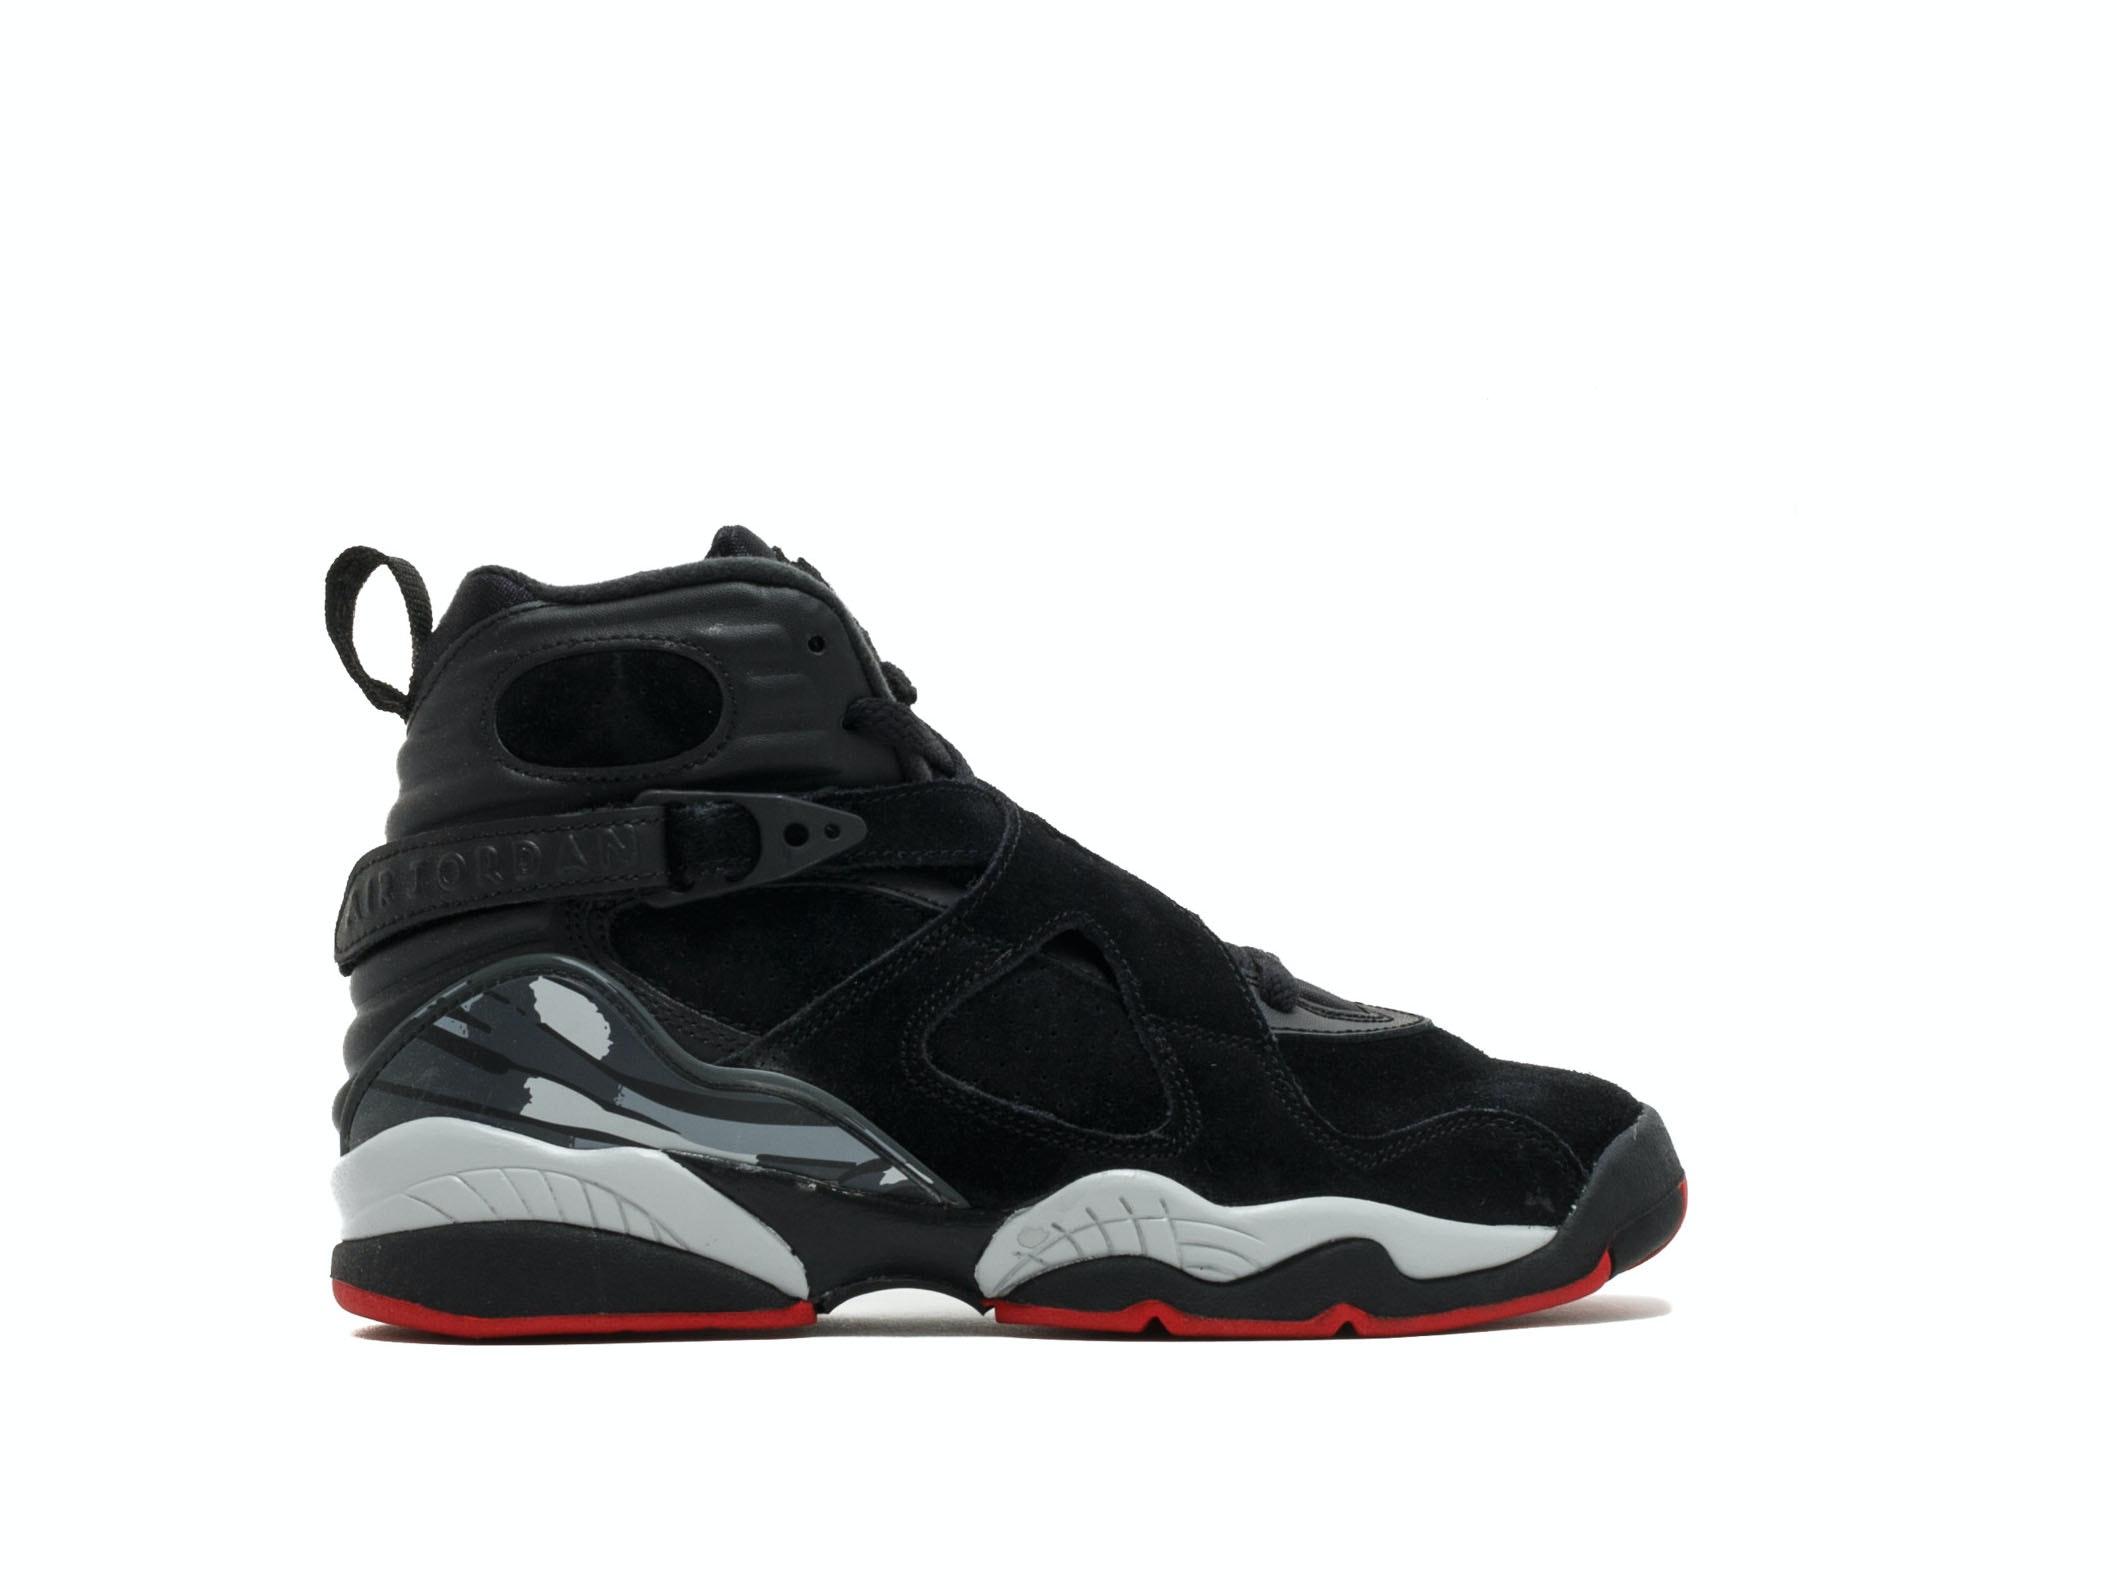 0c37e71c69b5 Shop Air Jordan 8 Retro GS Bred Online